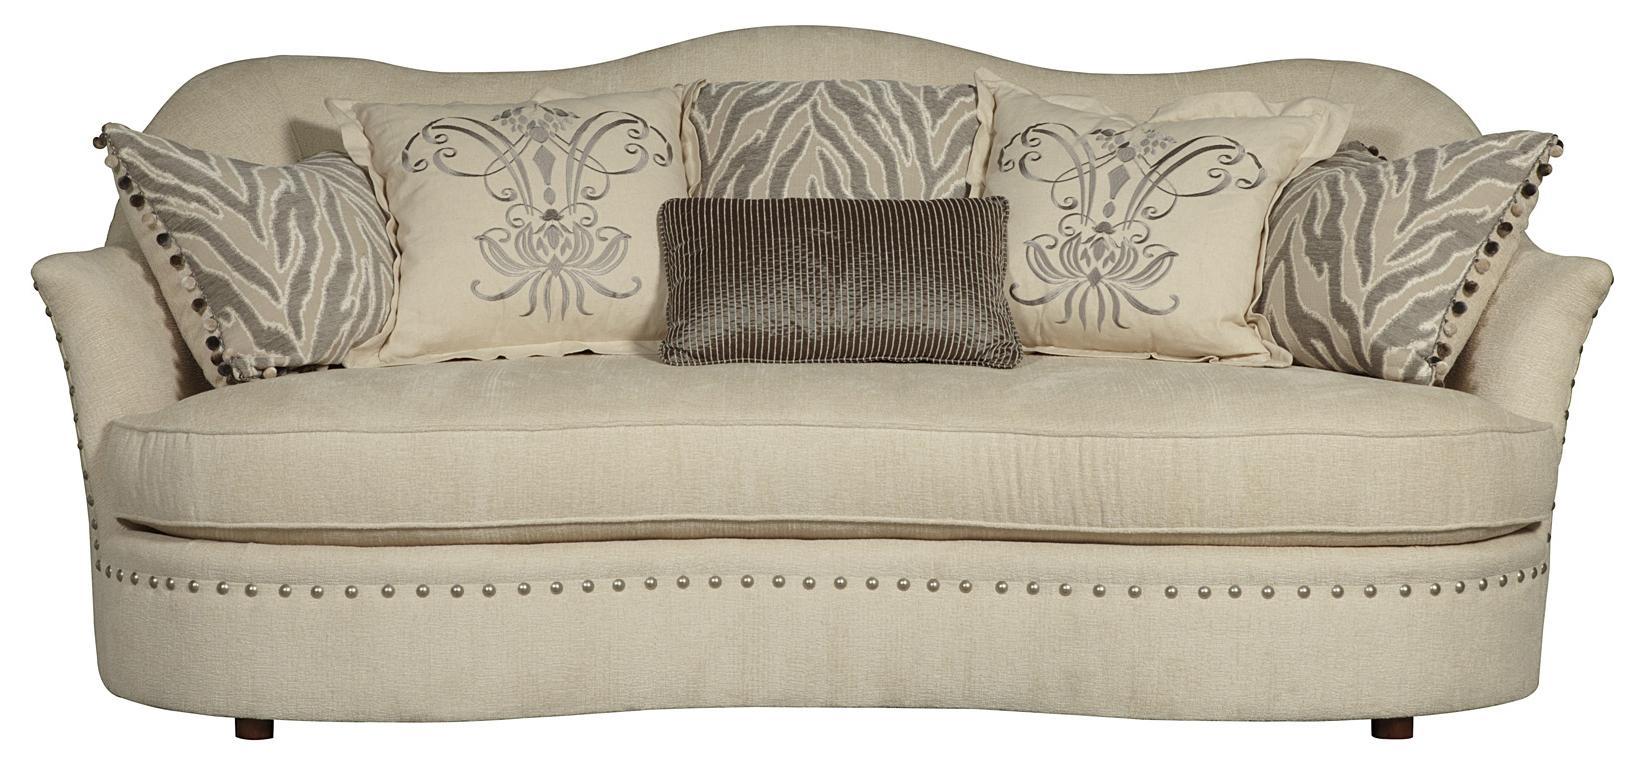 A.R.T. Furniture Inc Cotswold Amanda   Ivory Sofa   Item Number:  204501 5008AA